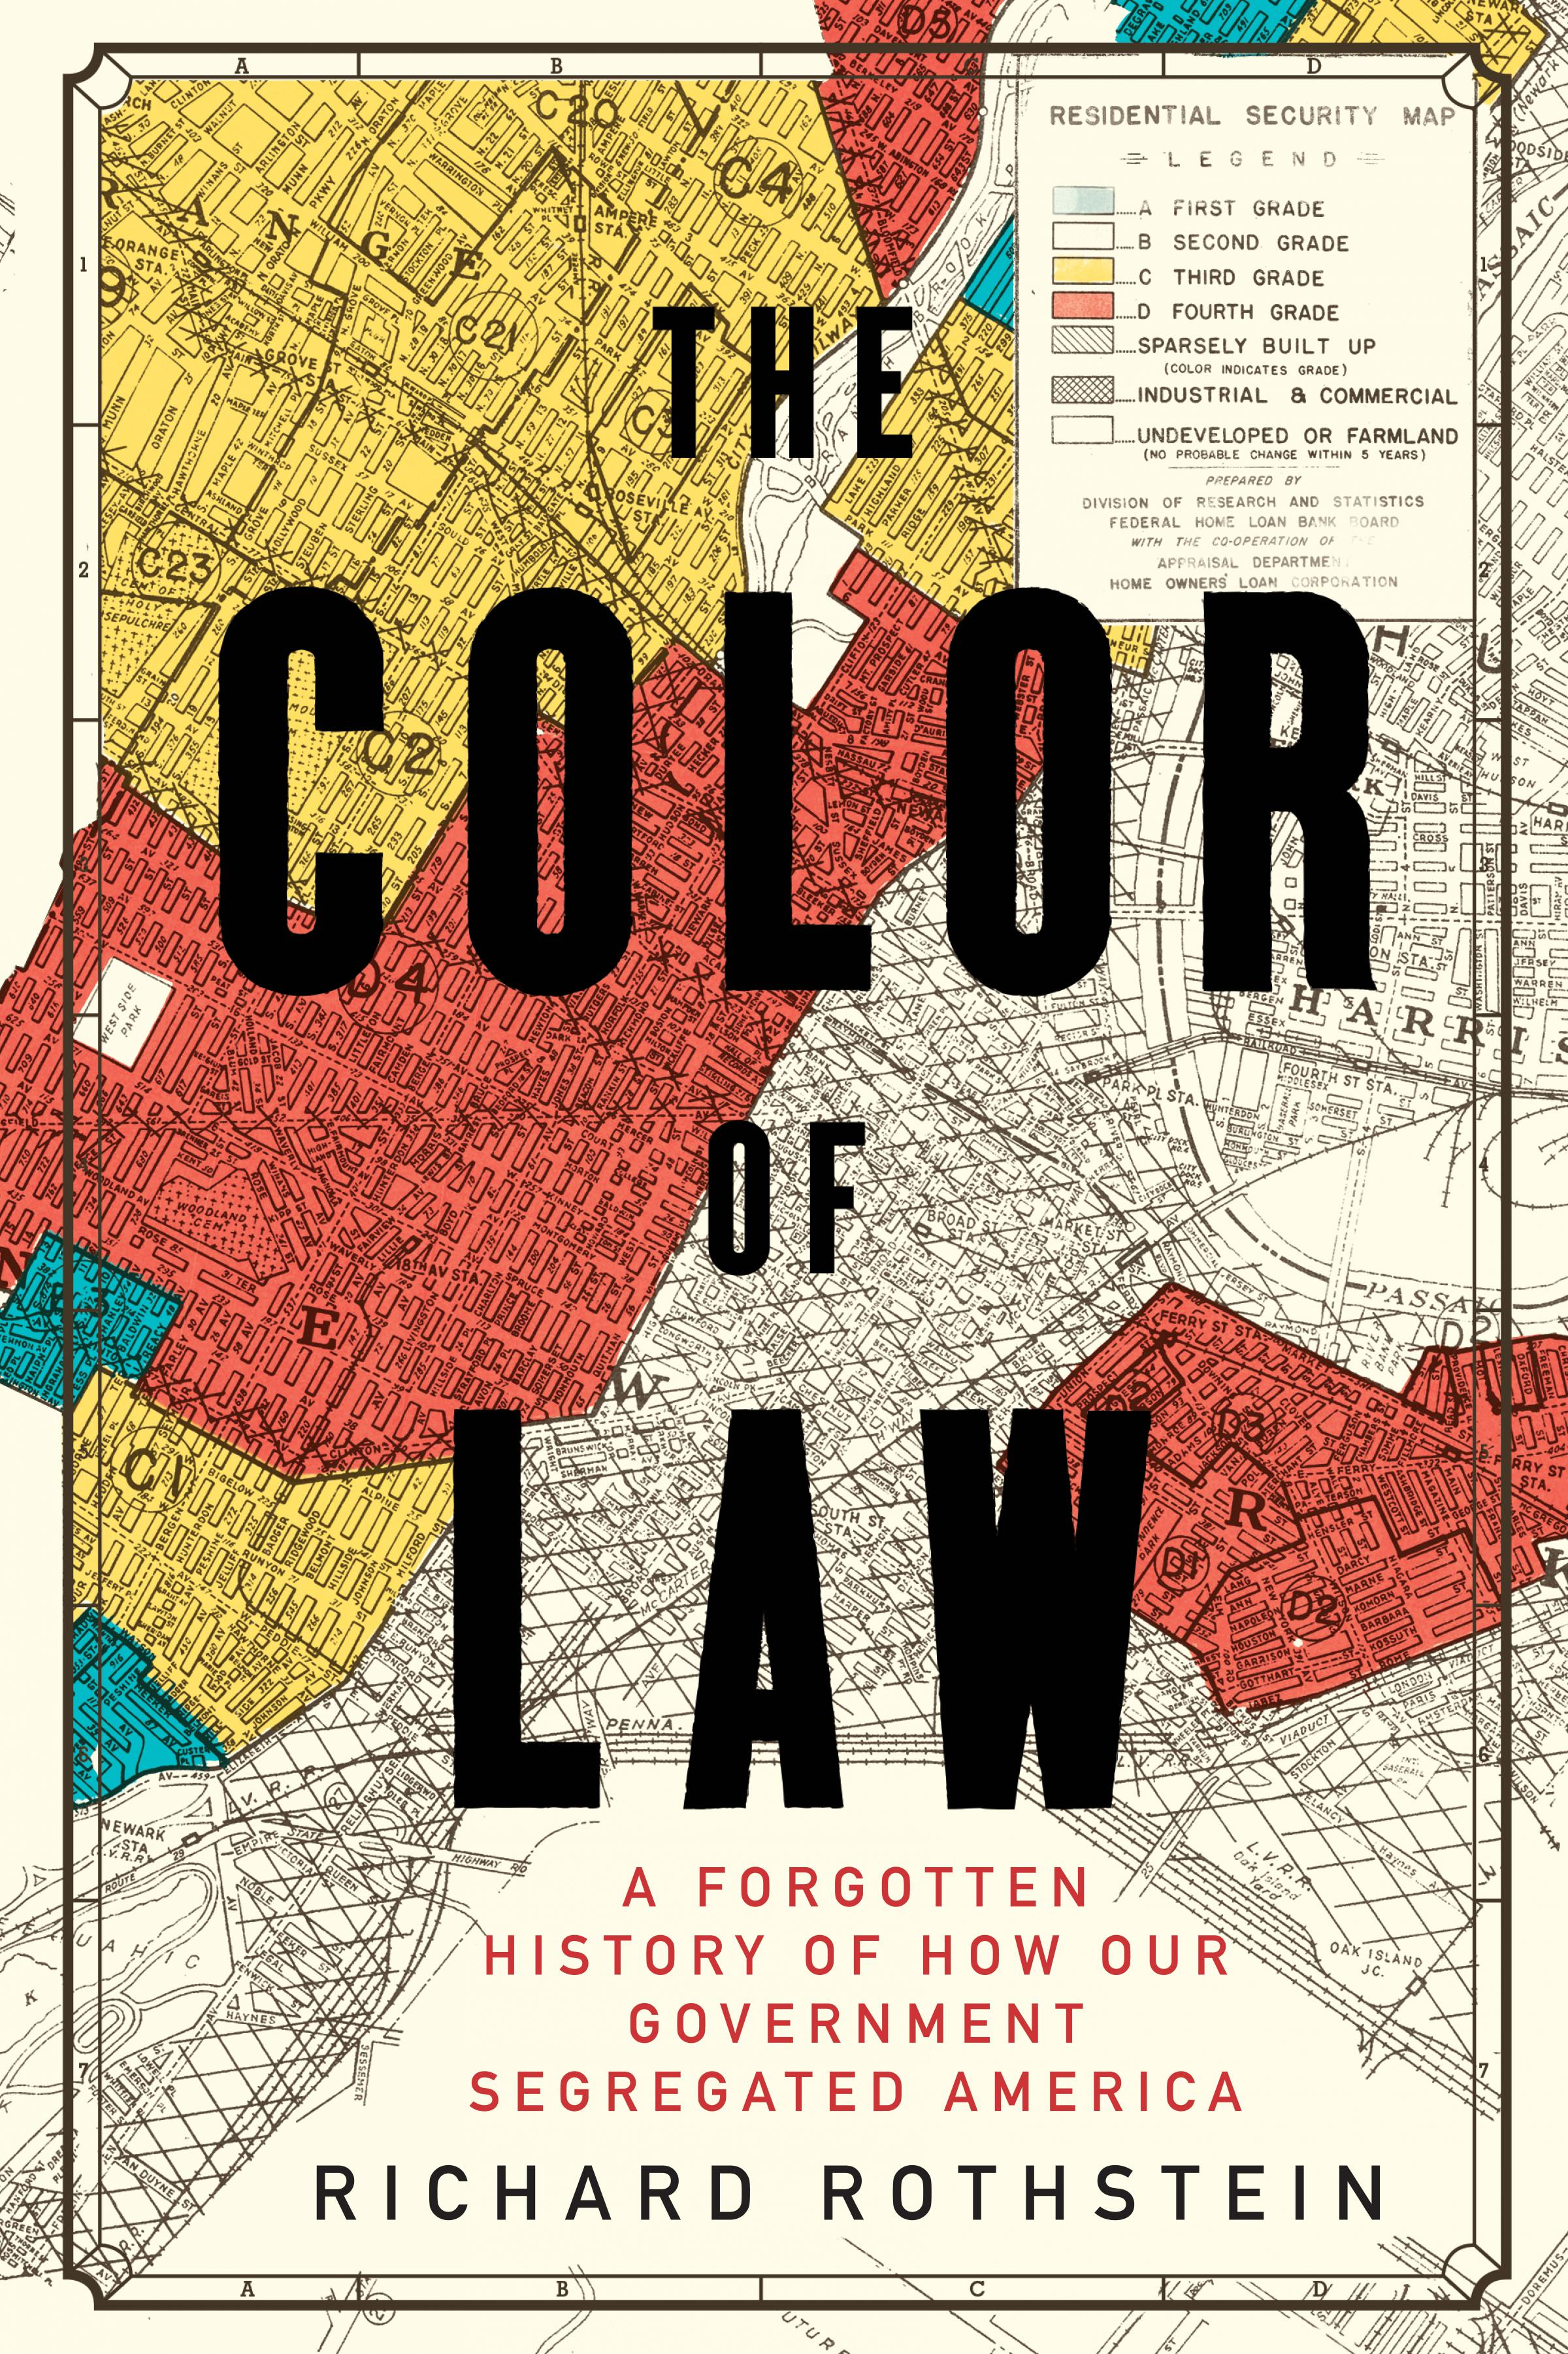 book_jacket_-_color_of_law.jpg